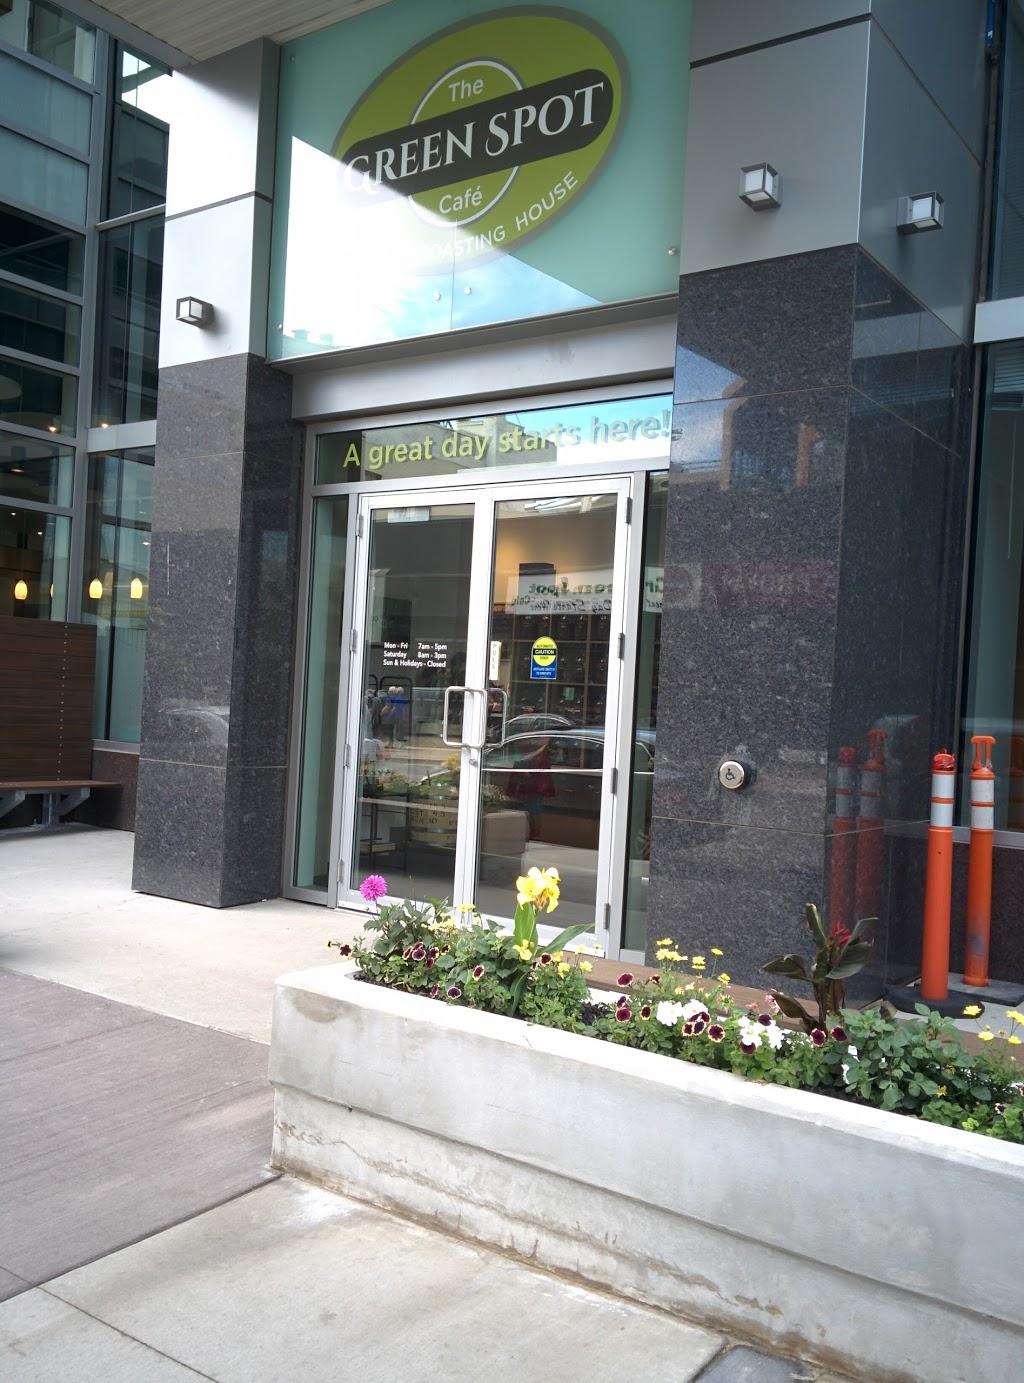 Greenspot Cafe | cafe | 1812 Hamilton St, Regina, SK S4P 2B8, Canada | 3067577899 OR +1 306-757-7899